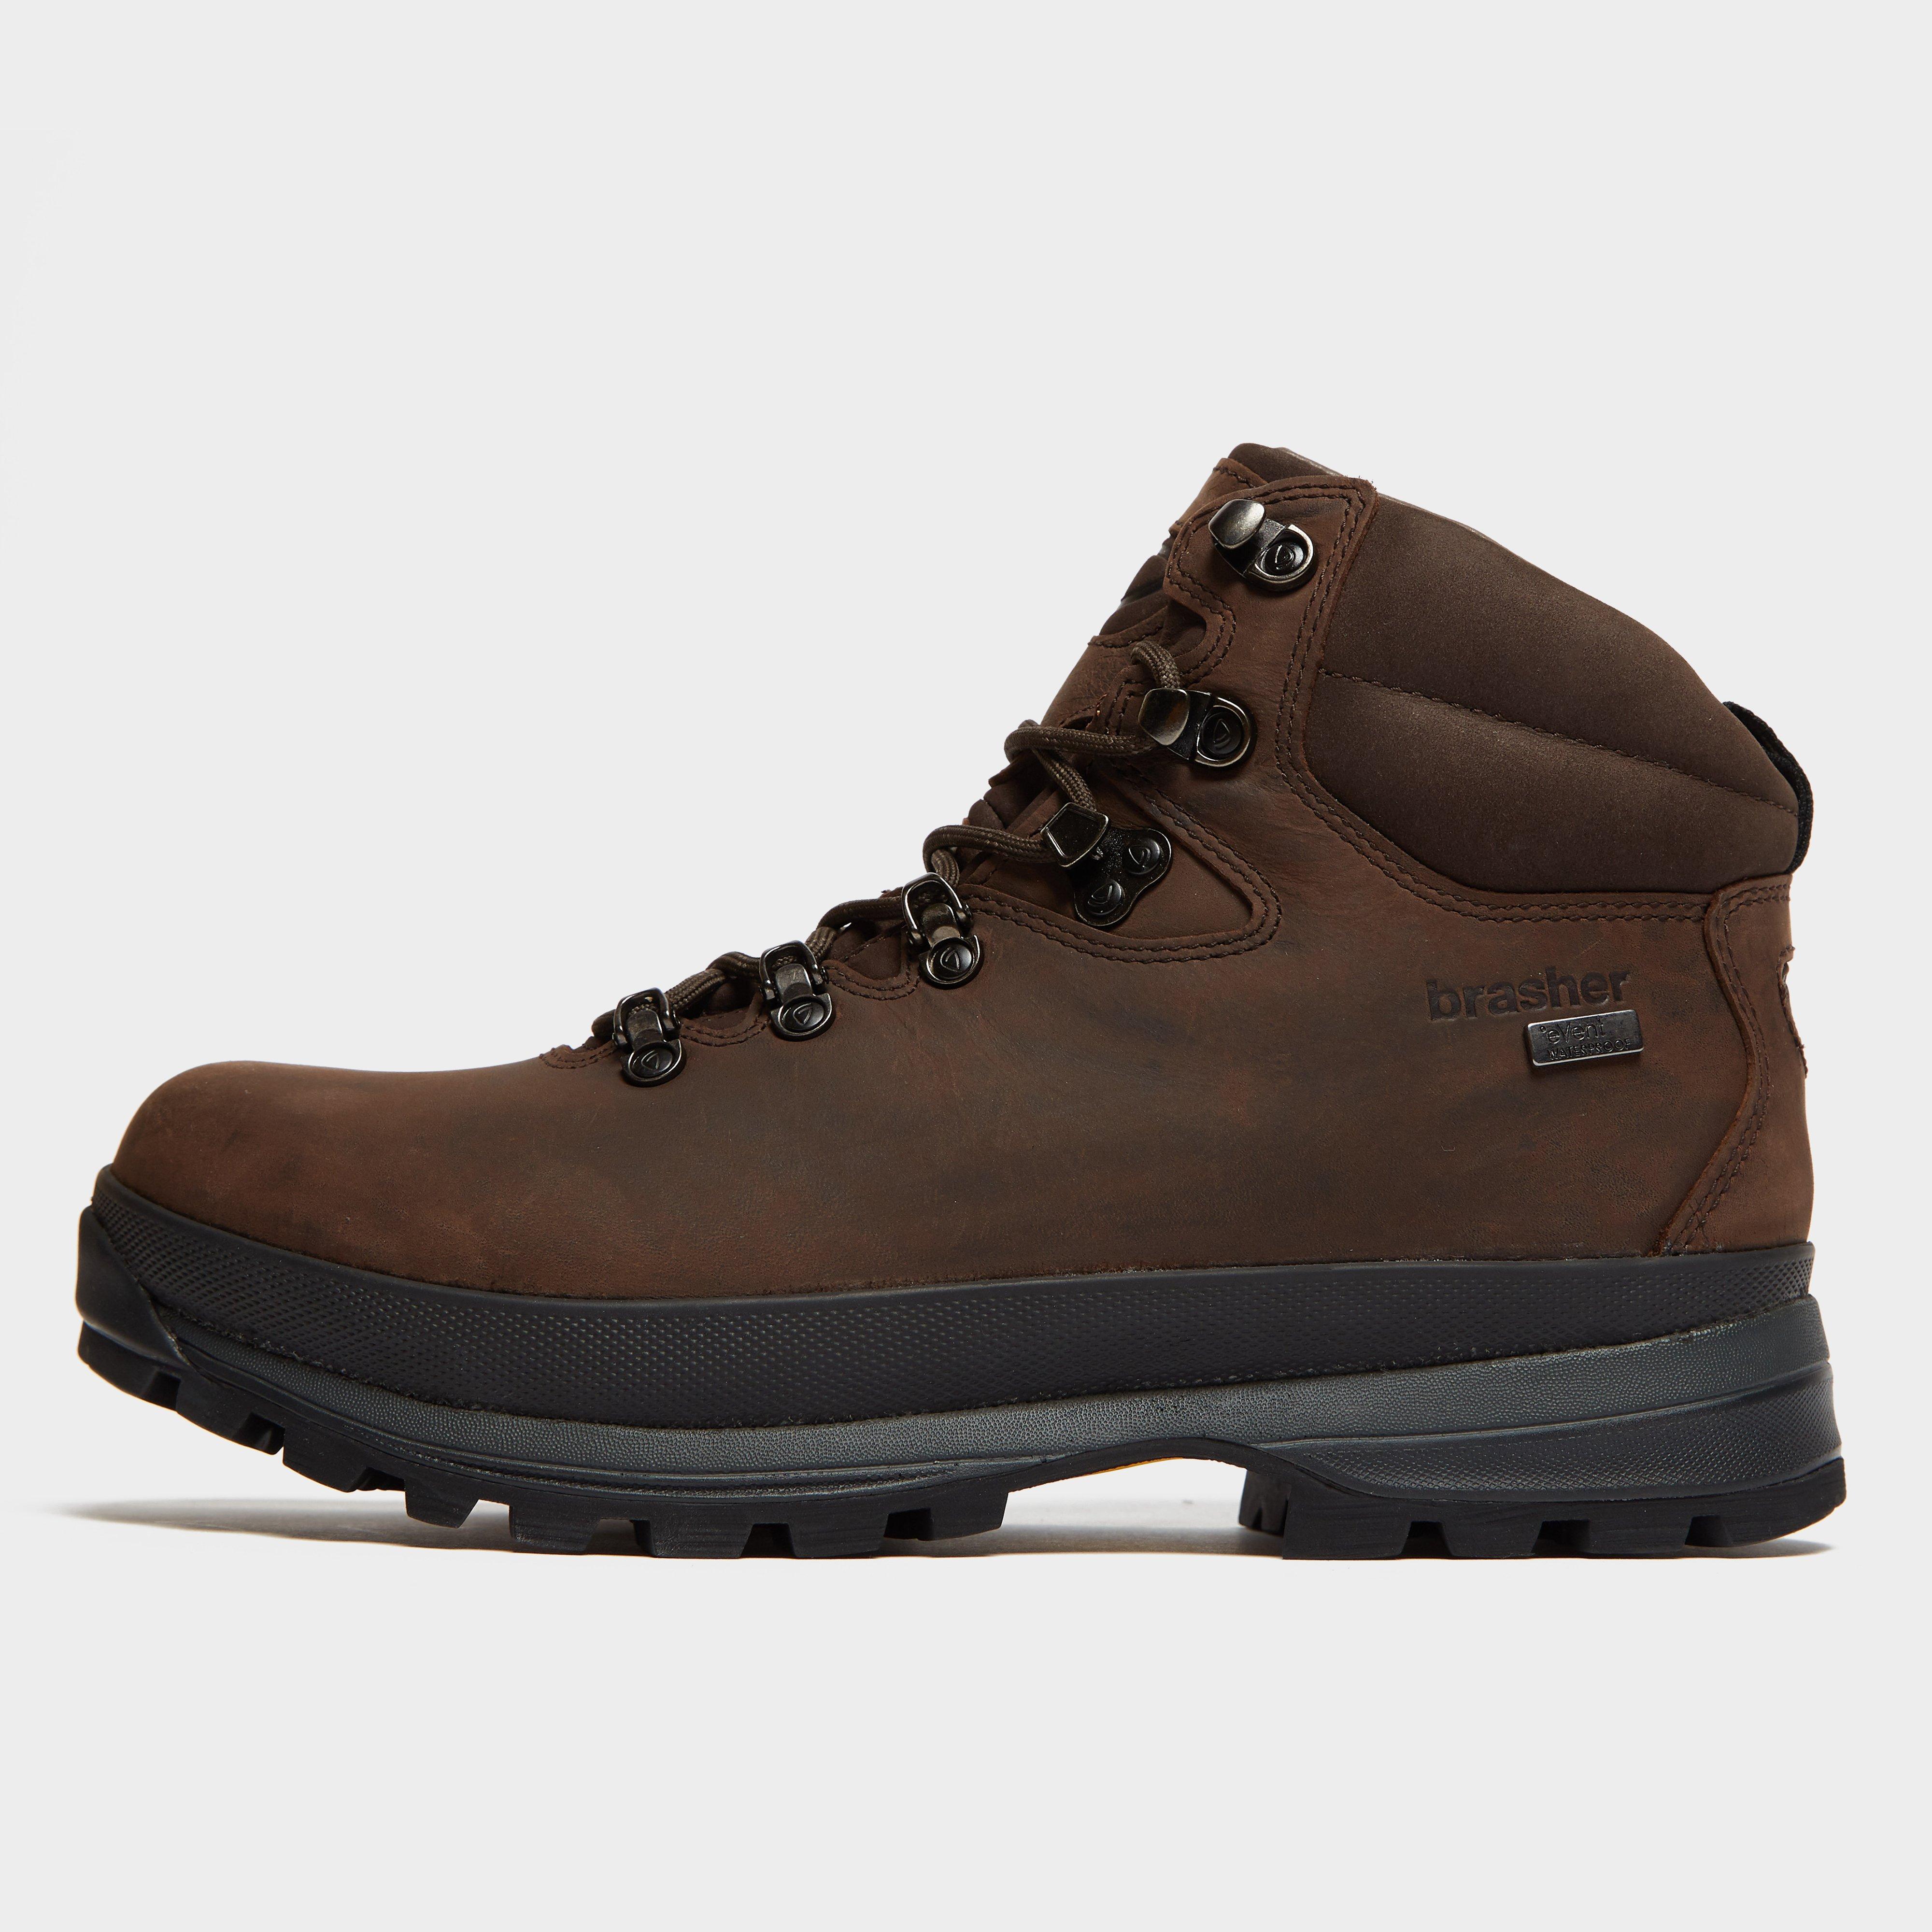 Brasher Brasher Mens Country Master Walking Boots - Brown, Brown